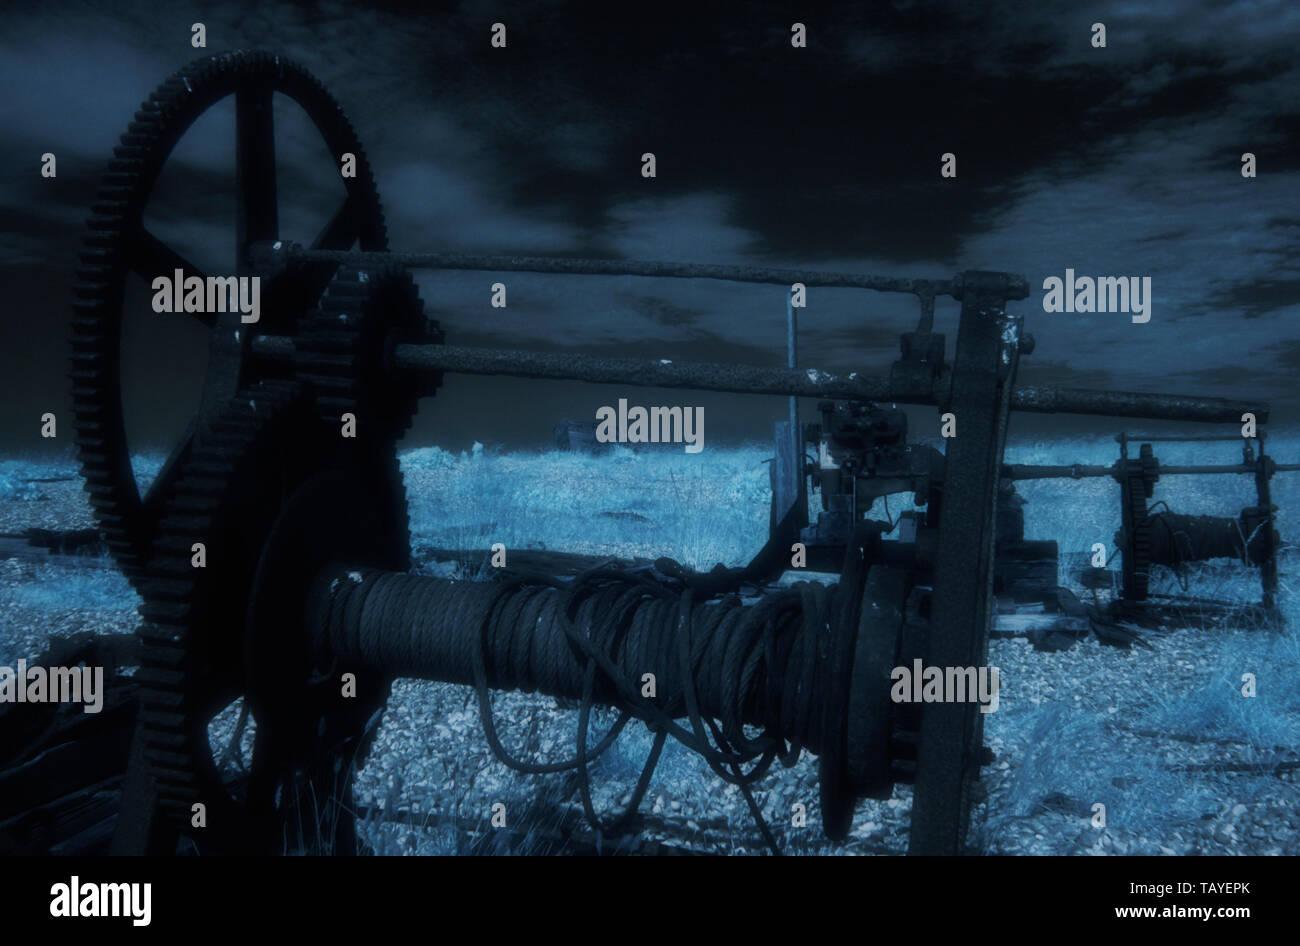 infrared image - rope winch - shingle beach - dungeness - romney marsh - kent - UK - Stock Image